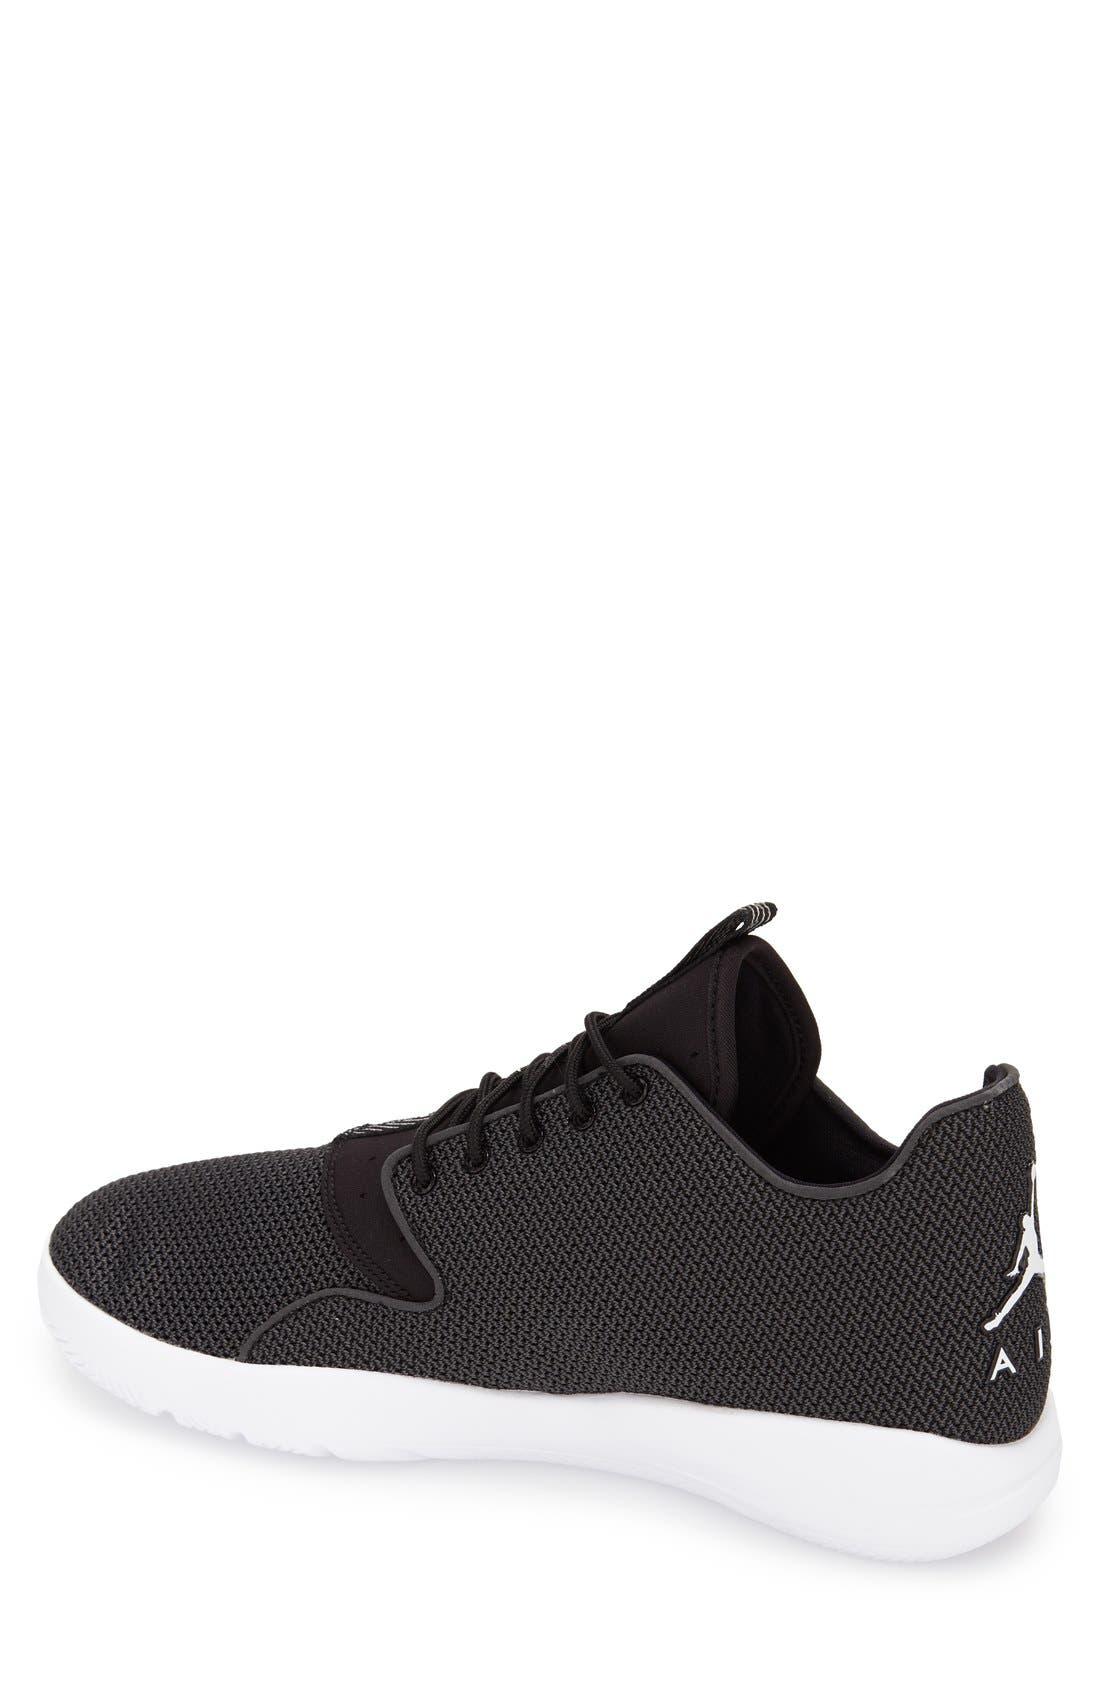 Alternate Image 2  - Nike 'Jordan Eclipse' Sneaker (Men)